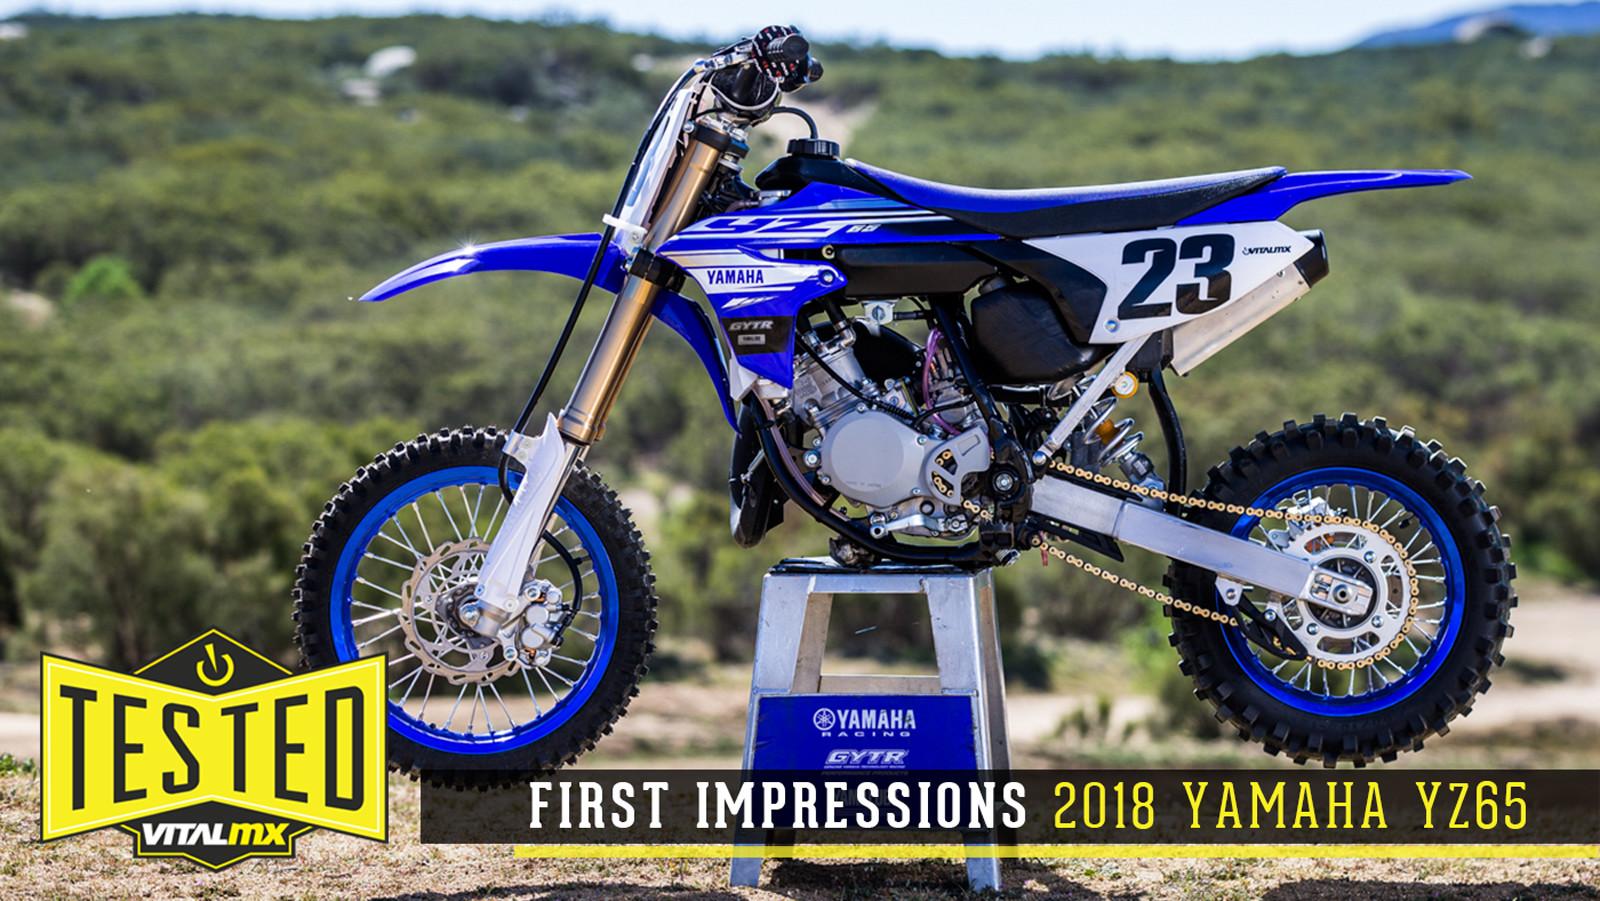 First Impressions: 2018 Yamaha YZ65